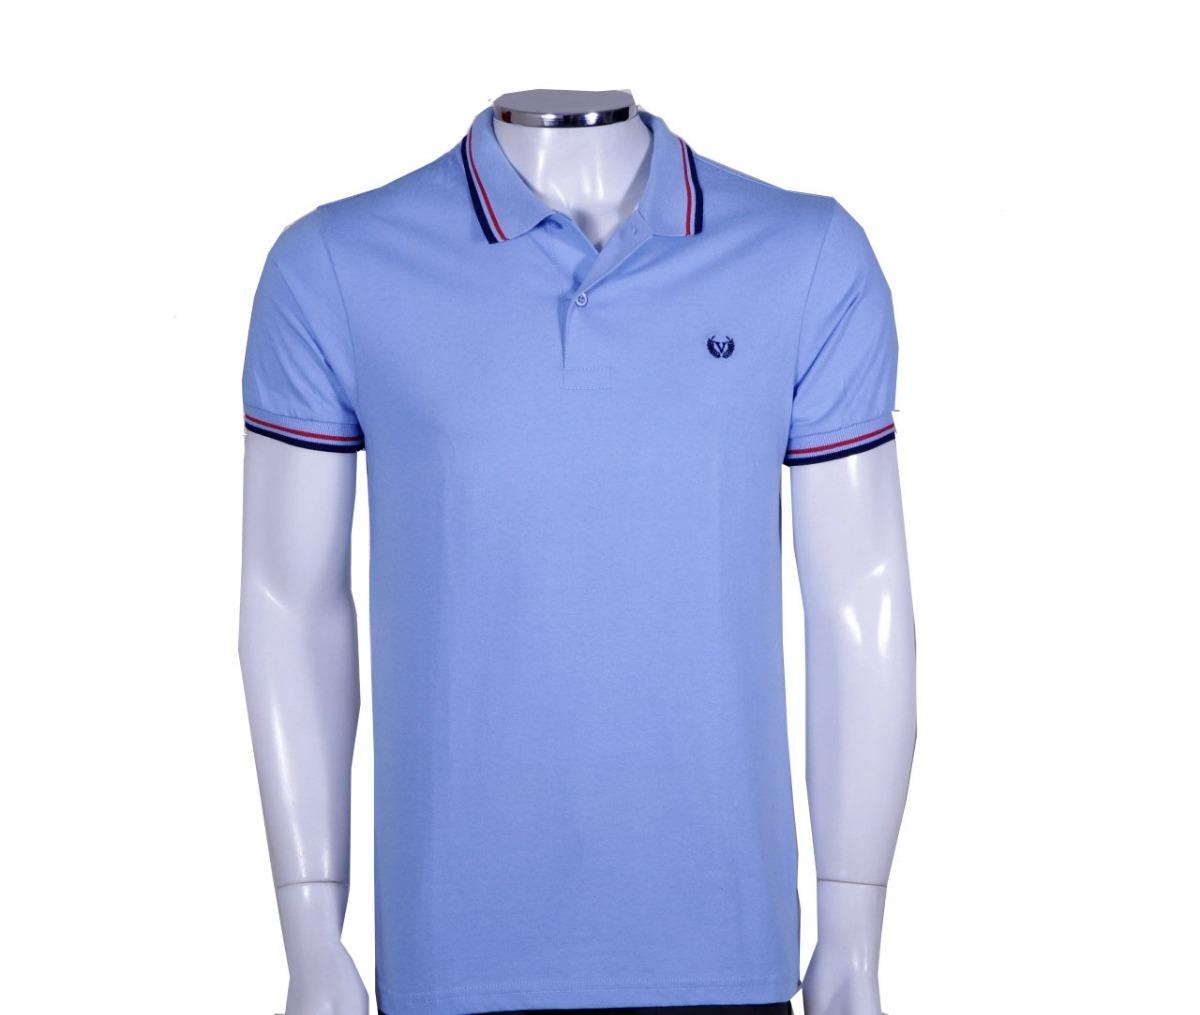 camisa polo vilejack gp110. Carregando zoom. 1f61aa2a3c4